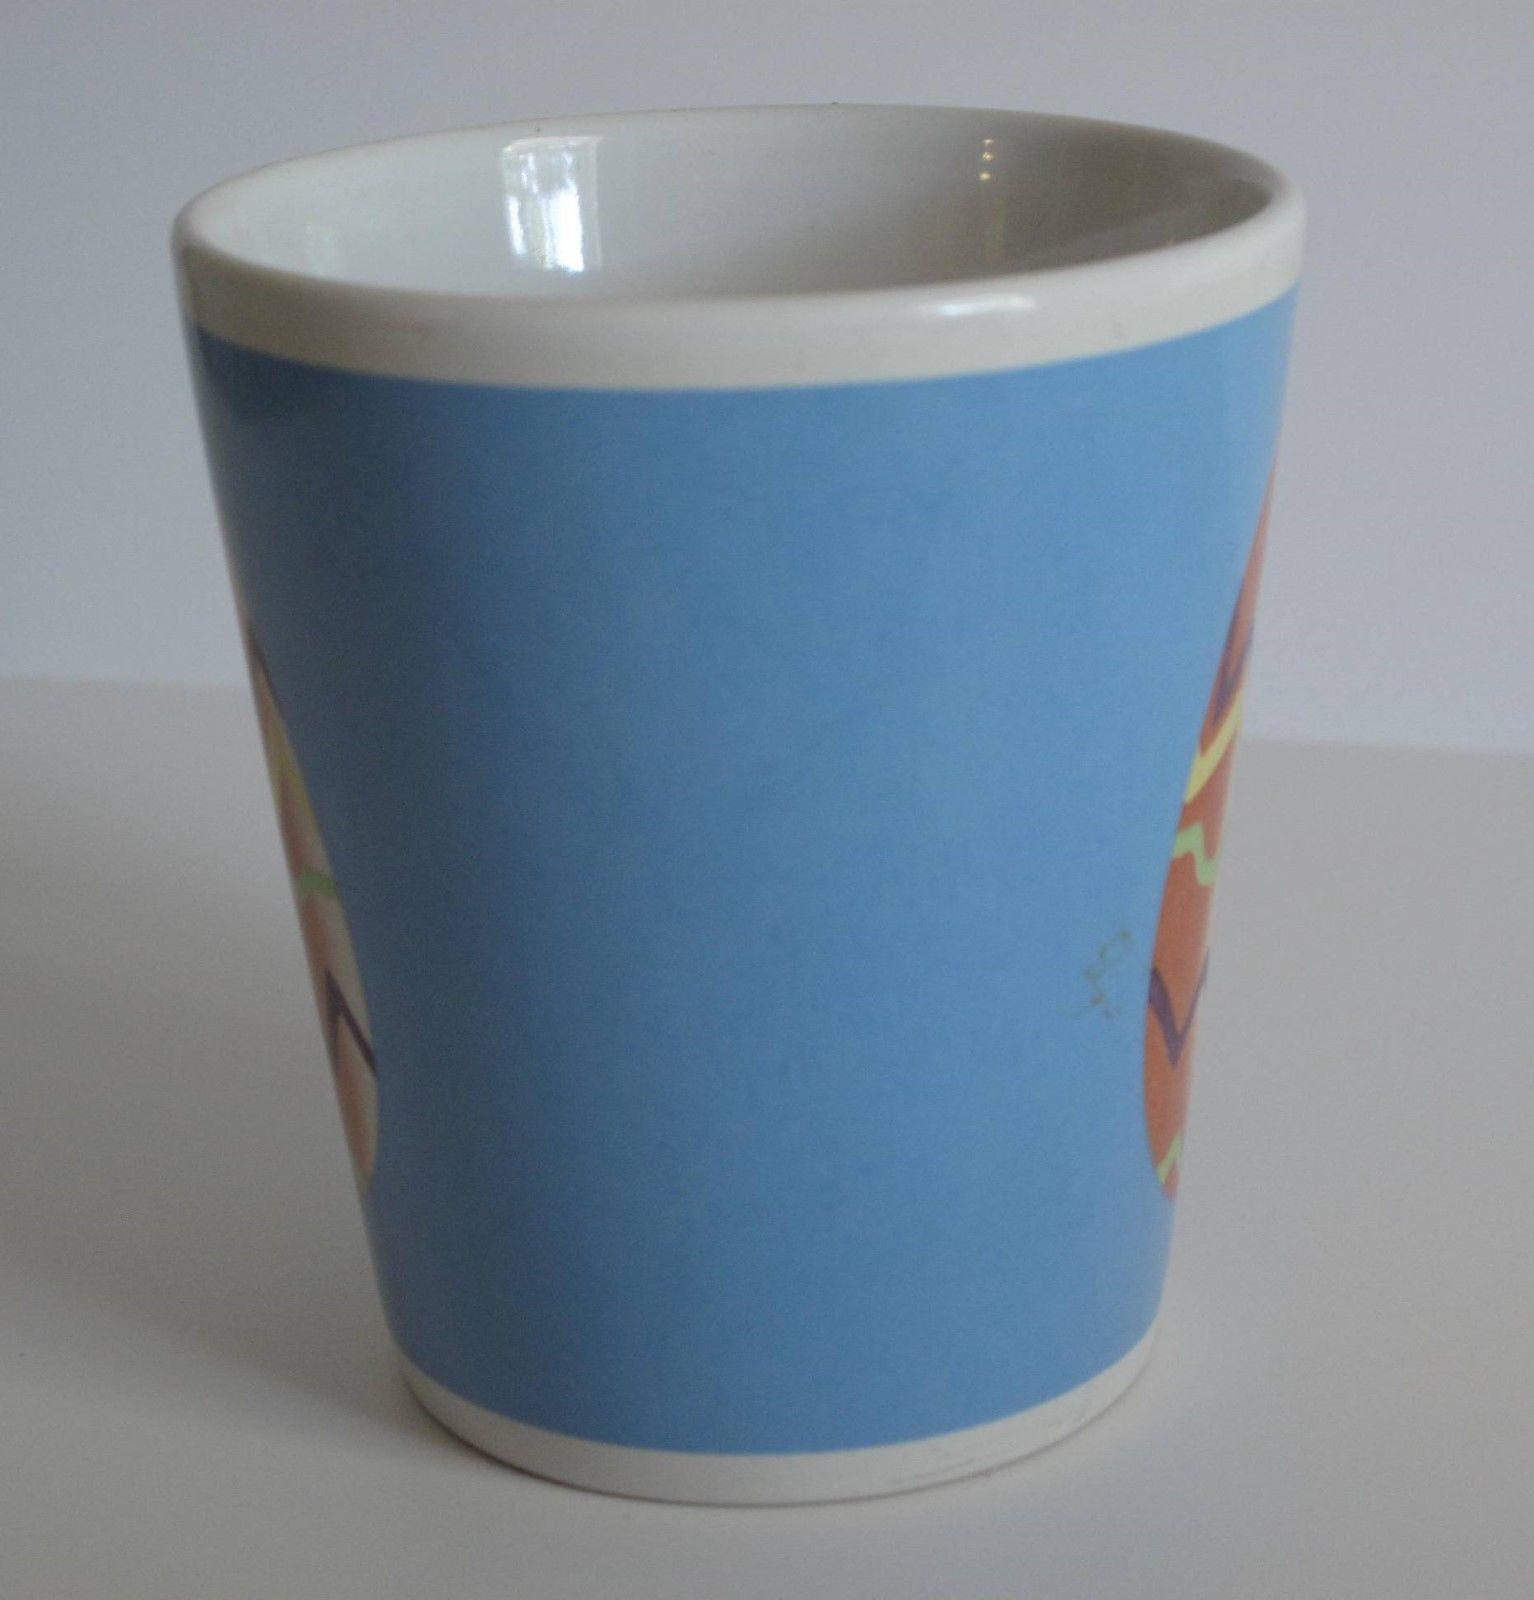 Easter Egg Multi-color Glass Mug 10 oz